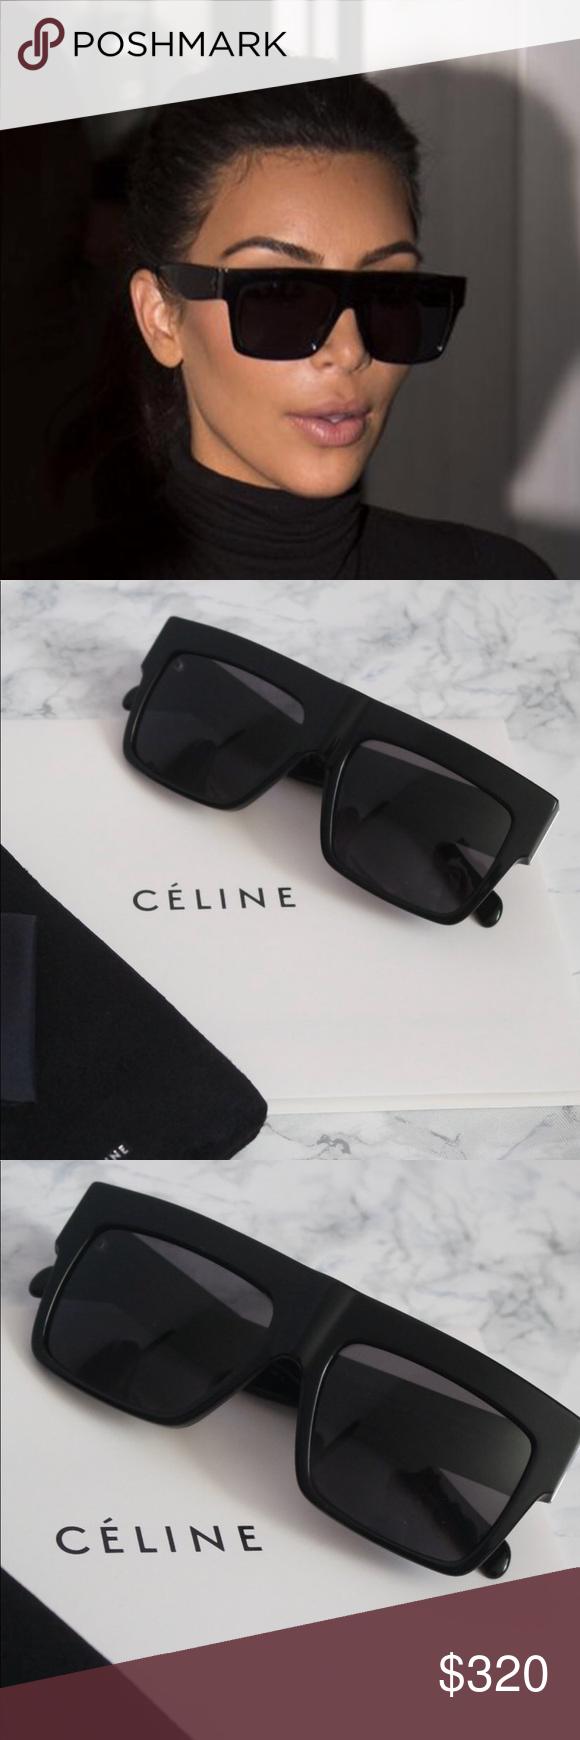 f65b8467f79e Black Celine ZZ Top sunglasses 😎😎😎🕶🕶🕶 Brand new Celine CL 41756